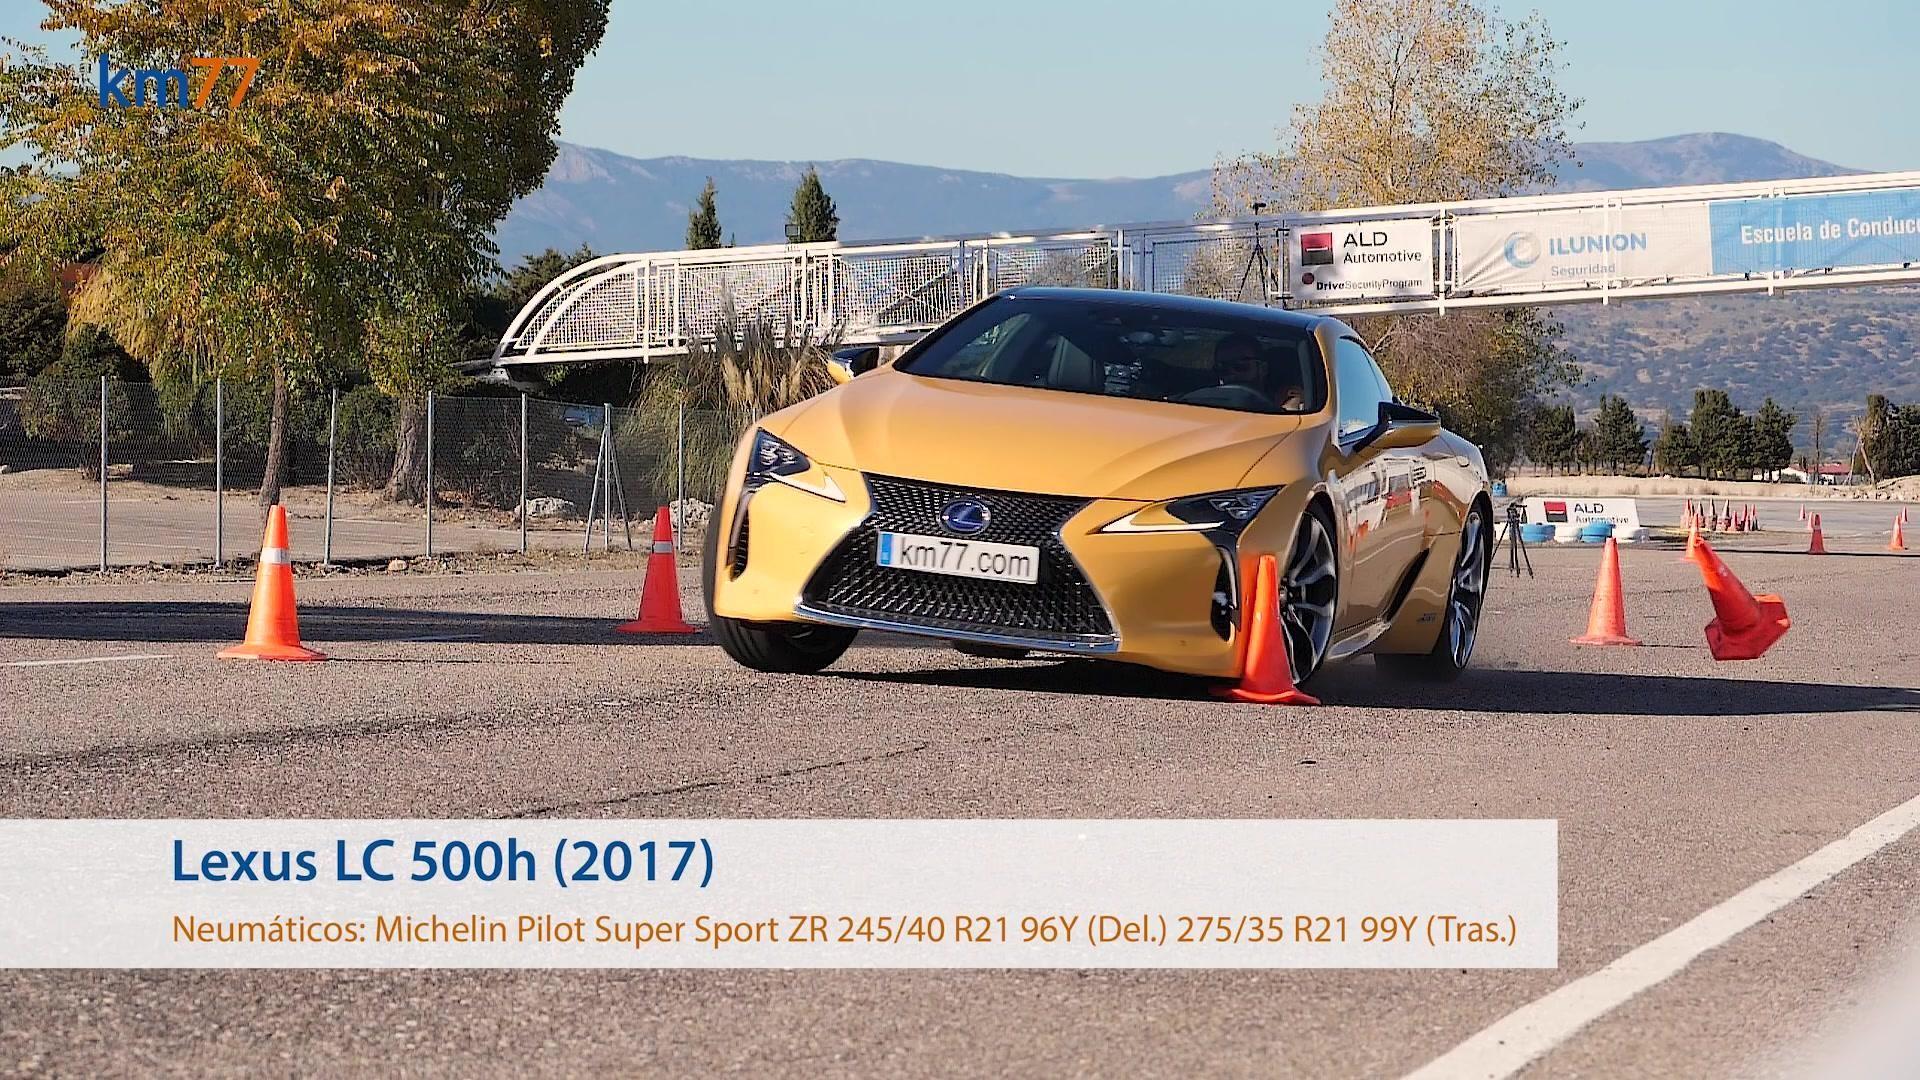 <b>SUV超70公里通过麋鹿测试意味着什么?</b>